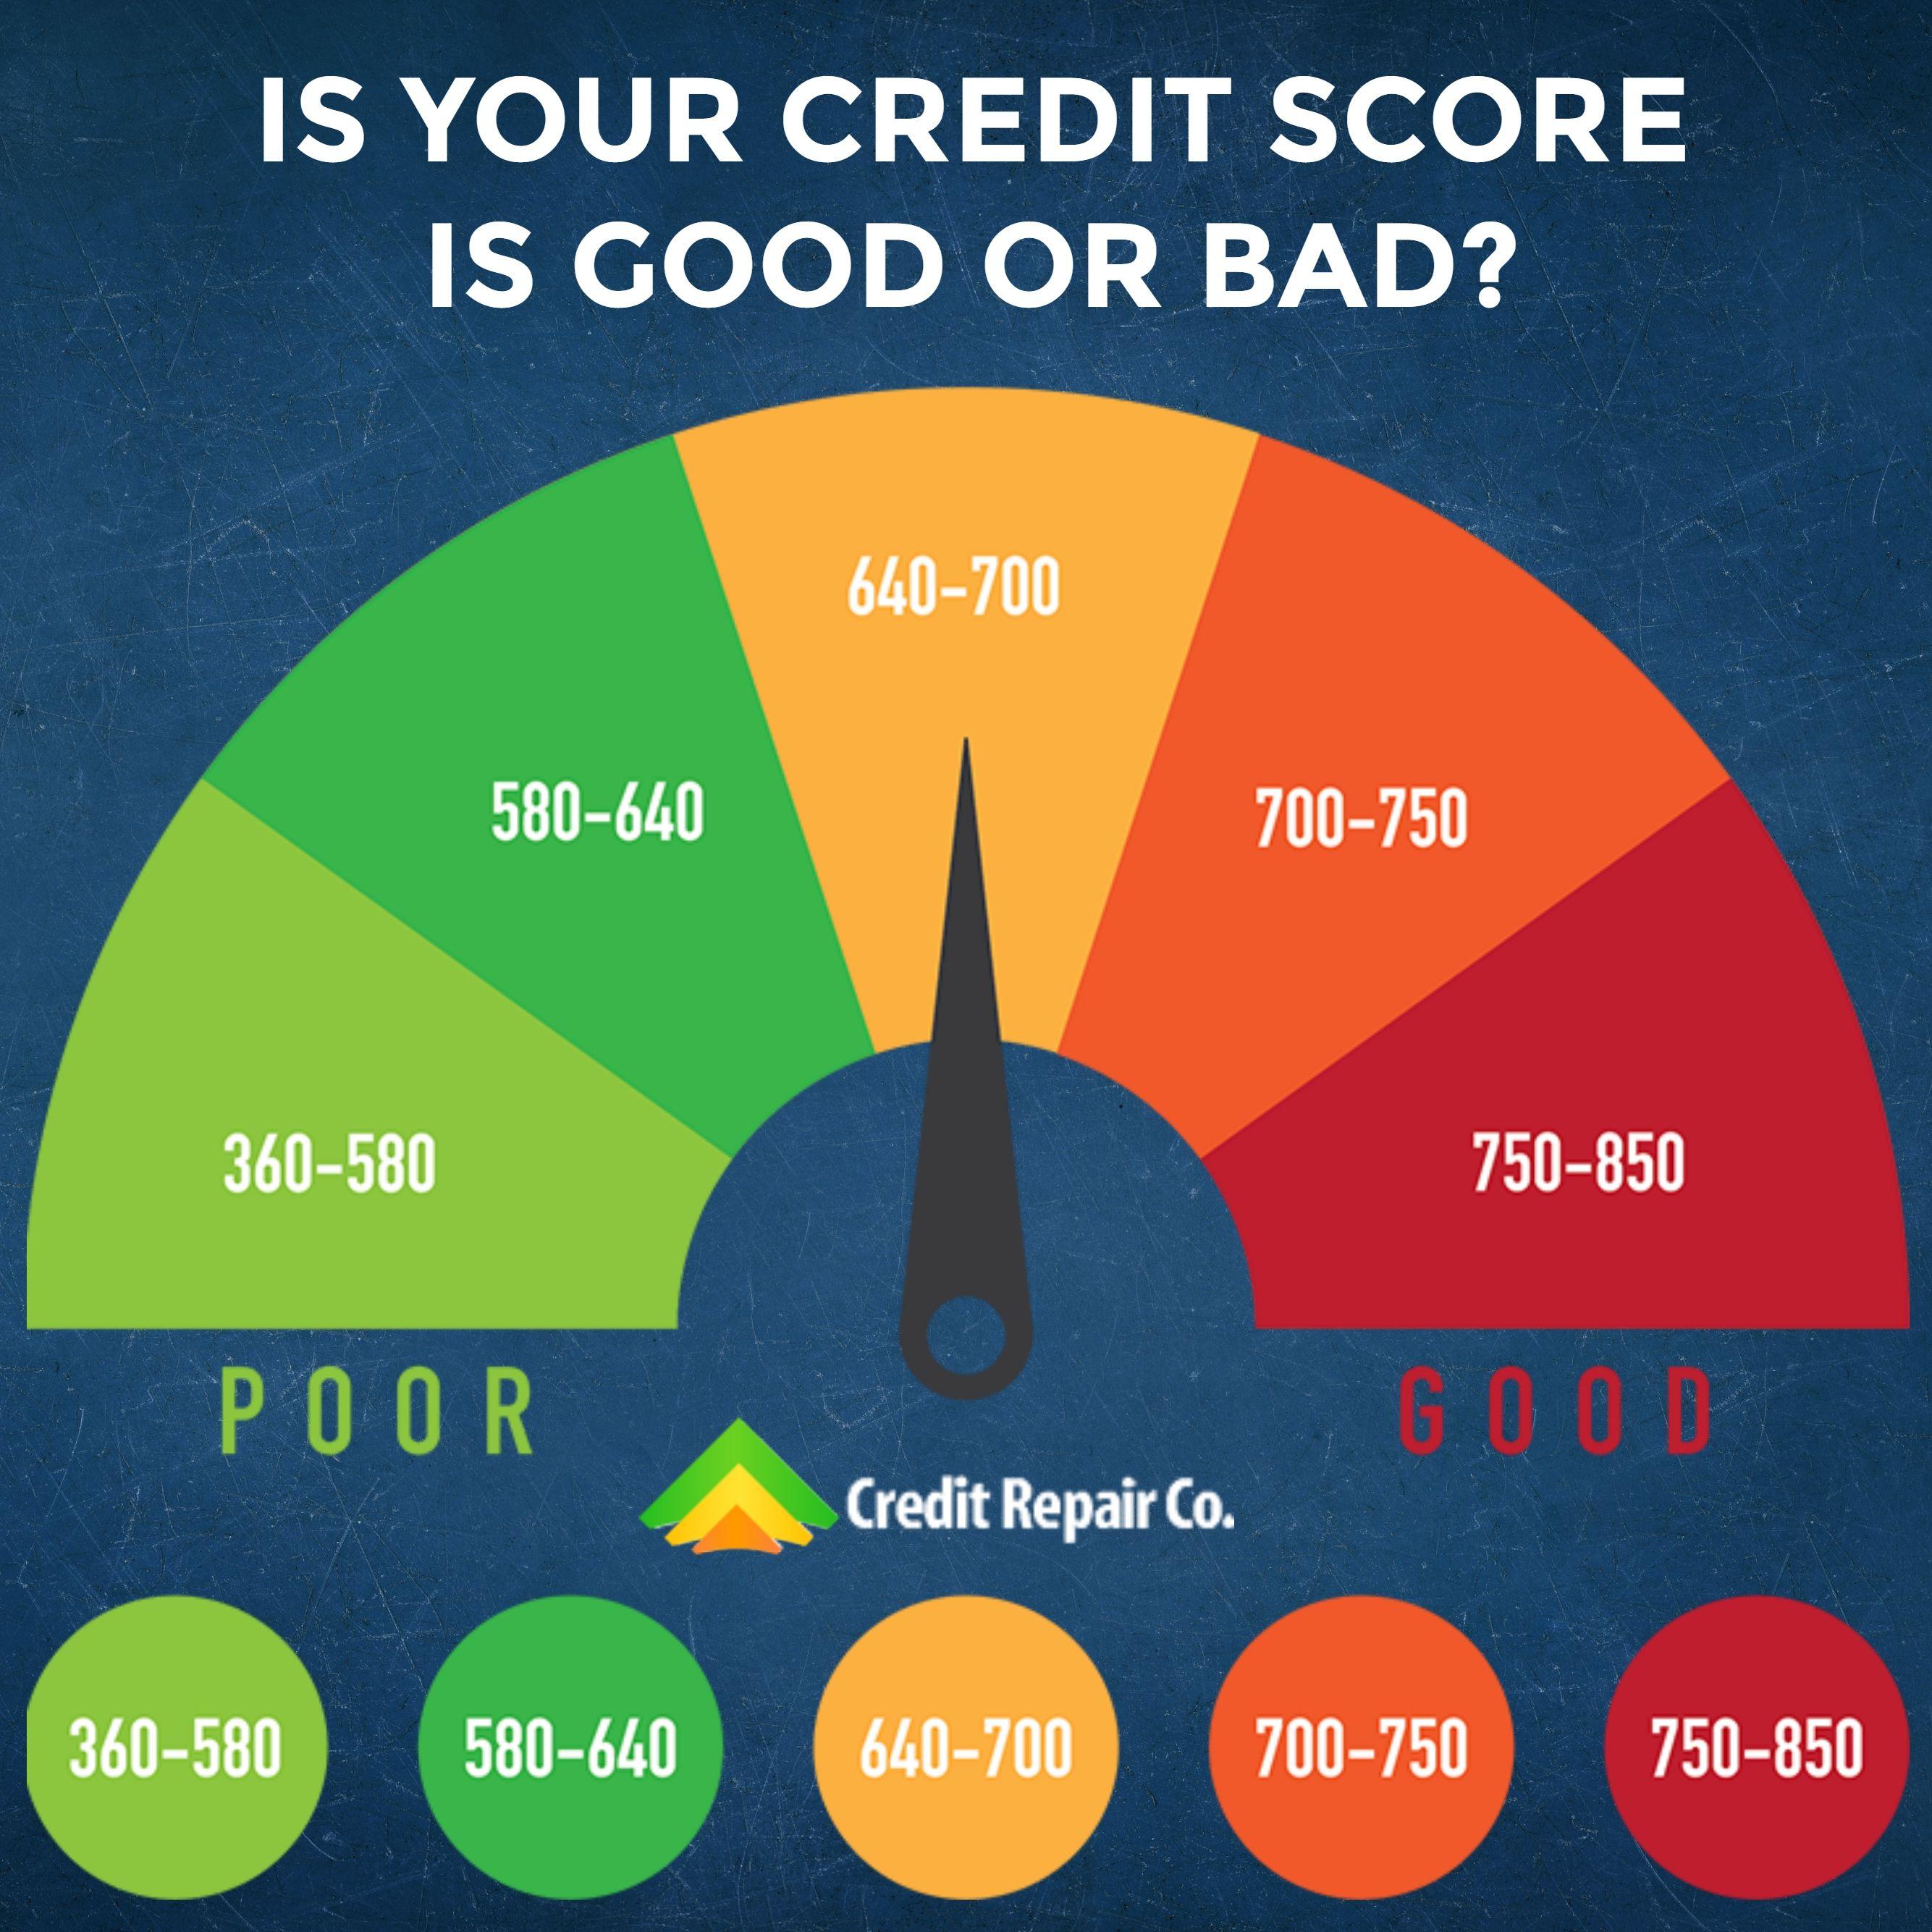 Bad Credit Score 300 599 Poor Credit Score 600 649 Fair Credit Score 650 699 Good Credit Score Good Credit Credit Score Credit Score Infographic